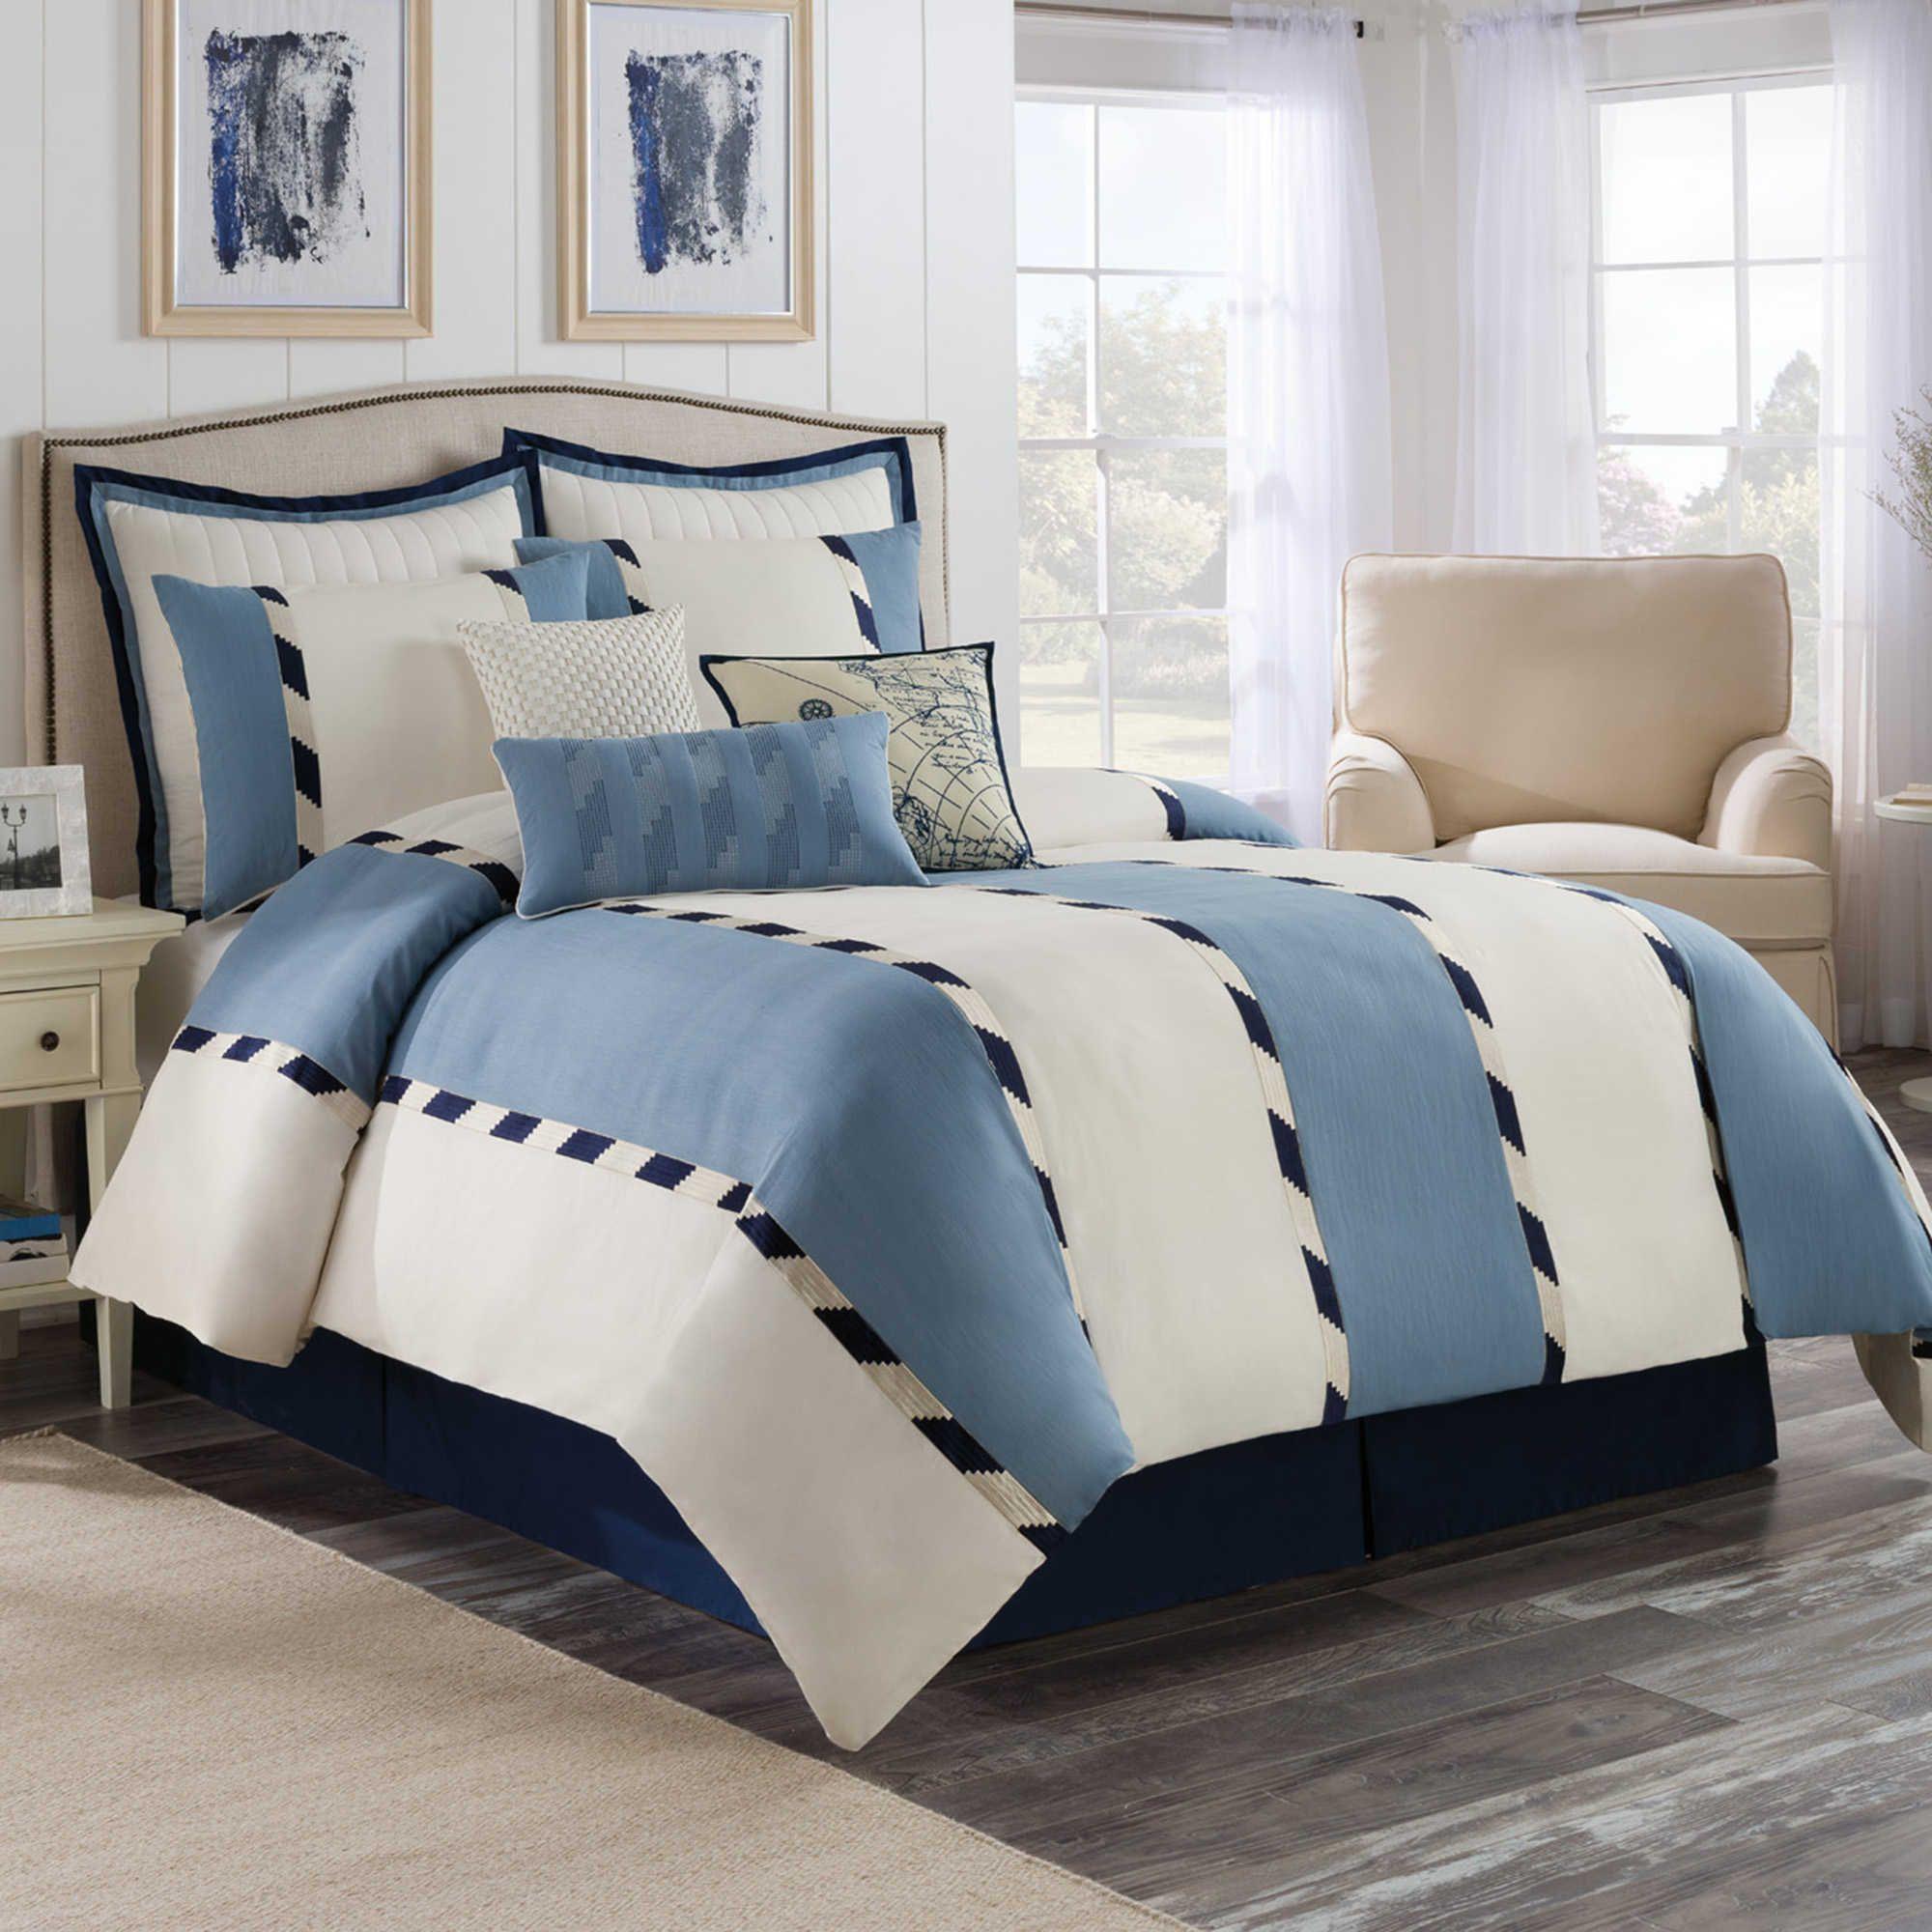 Bridge Street Chatham Comforter Set